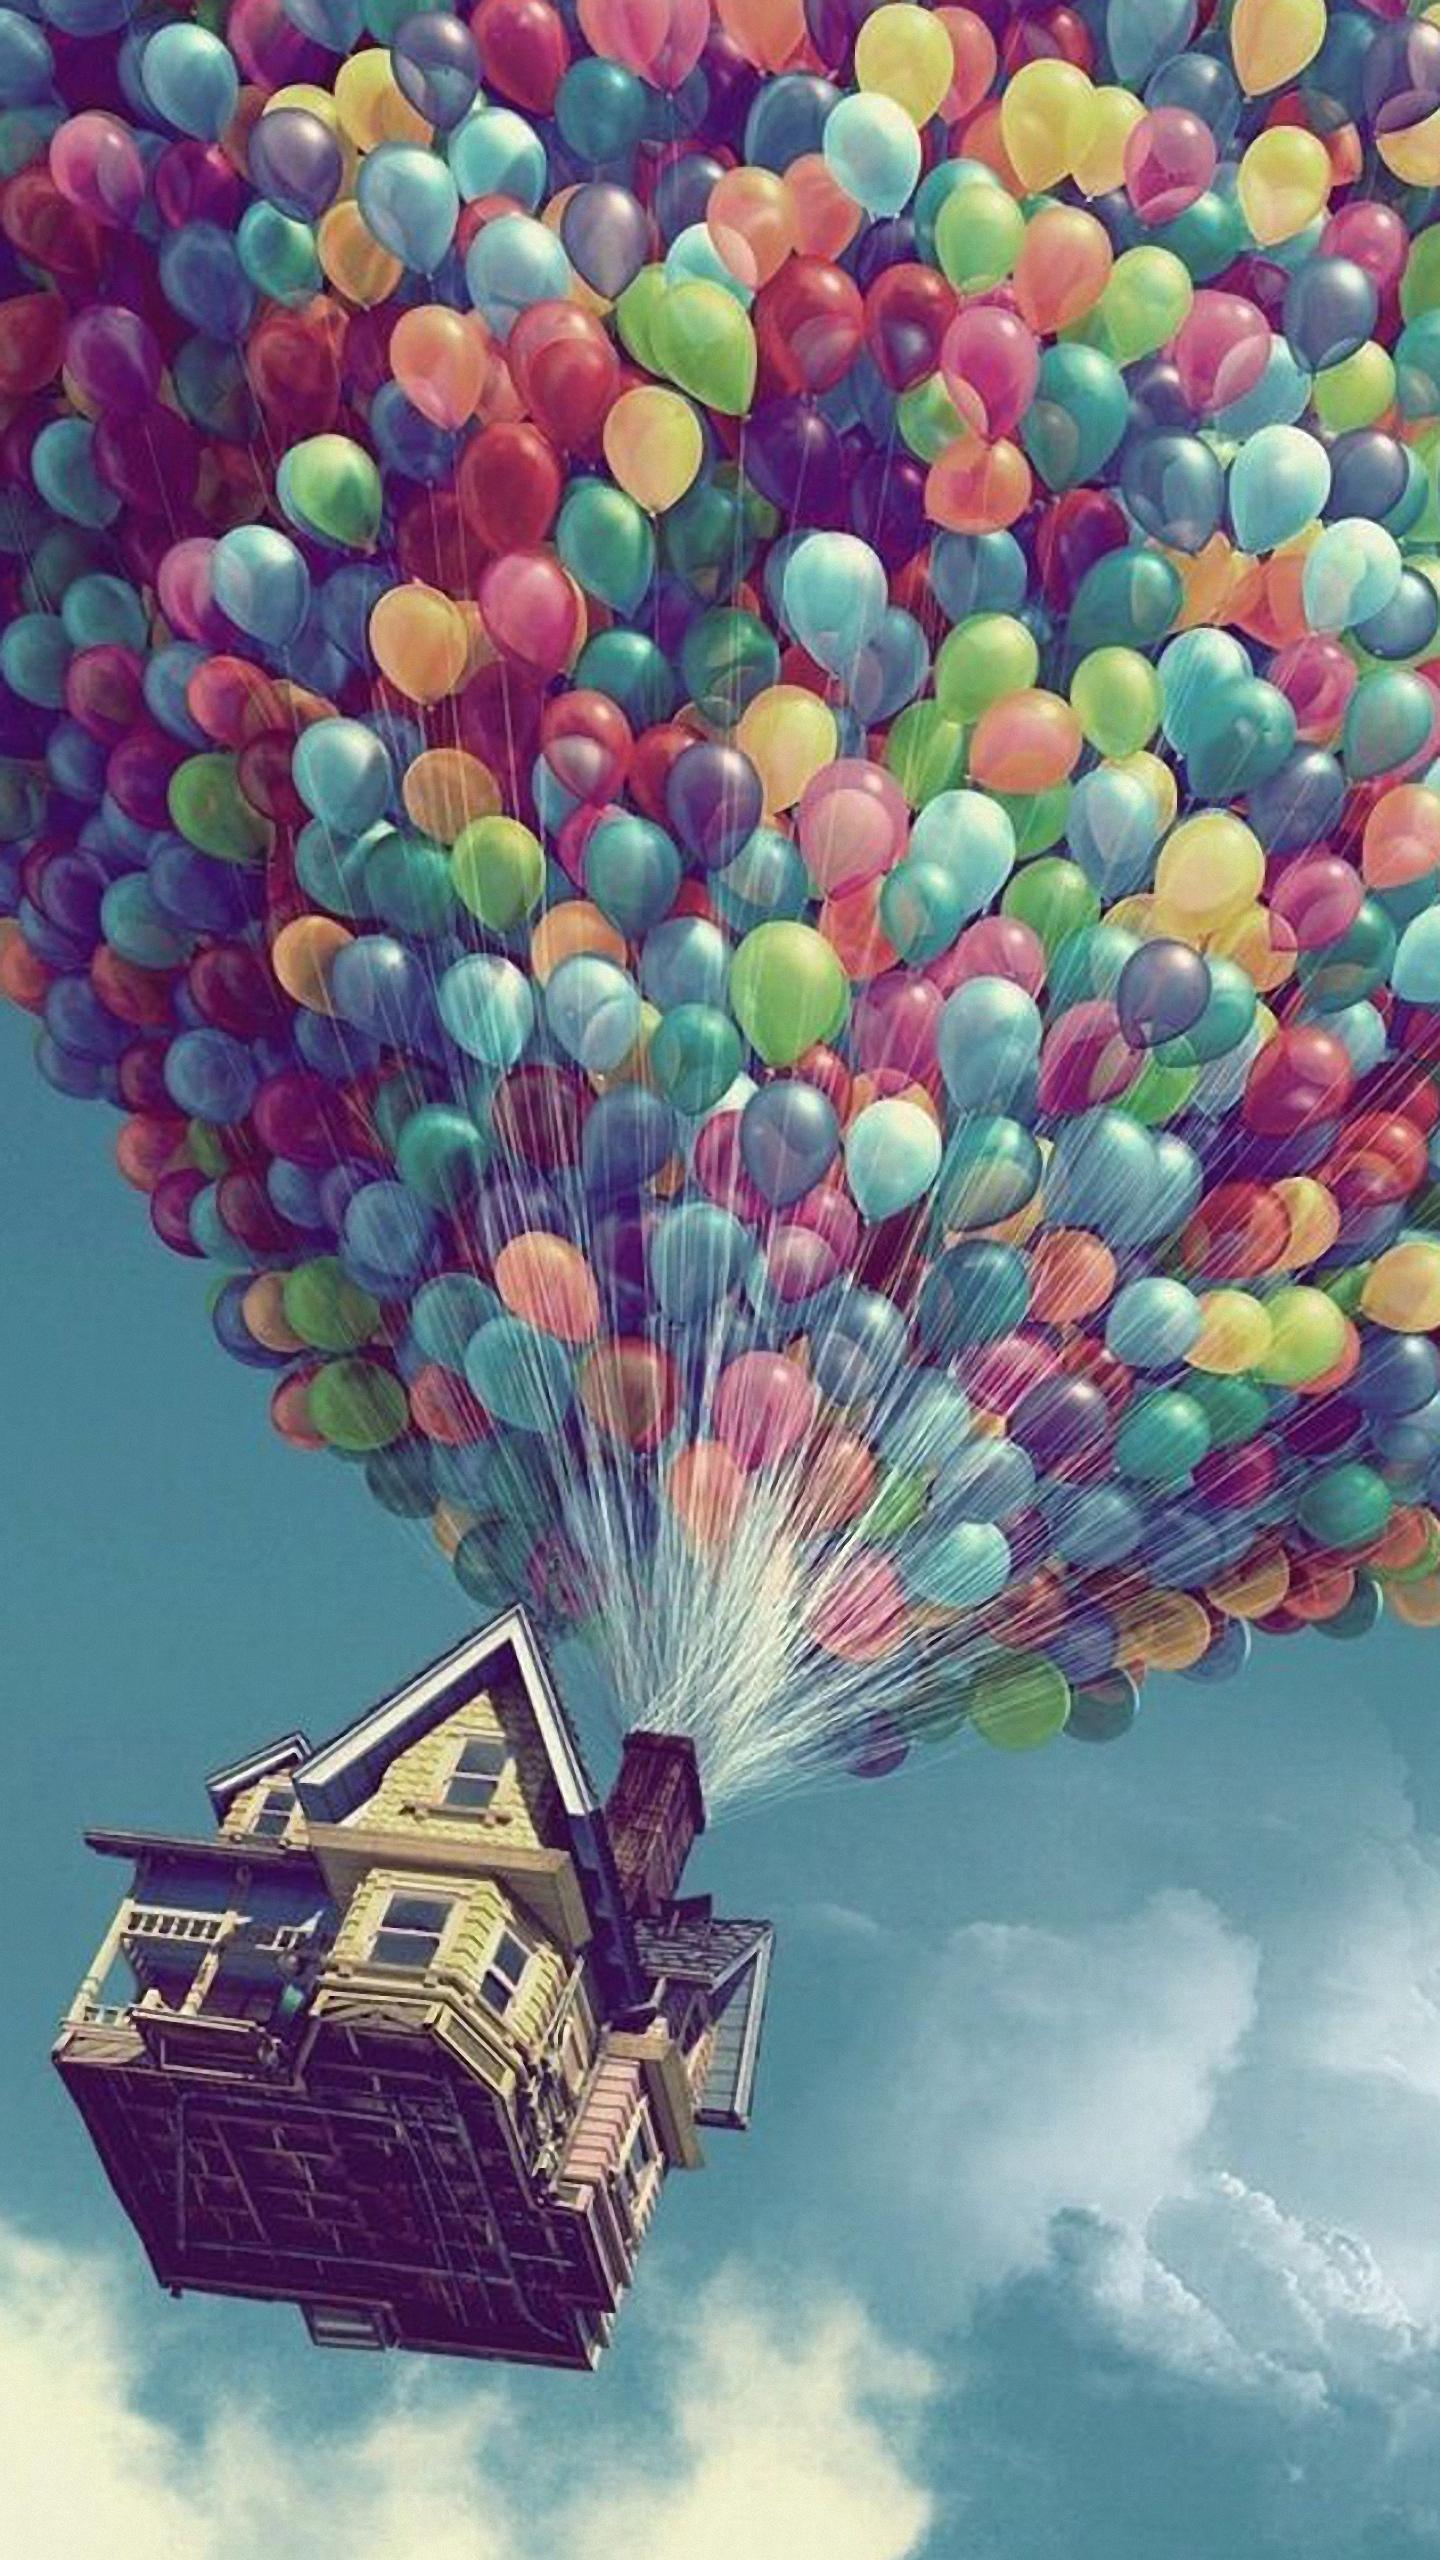 The Amazing Hot Air Balloon Screen Saver - WKU